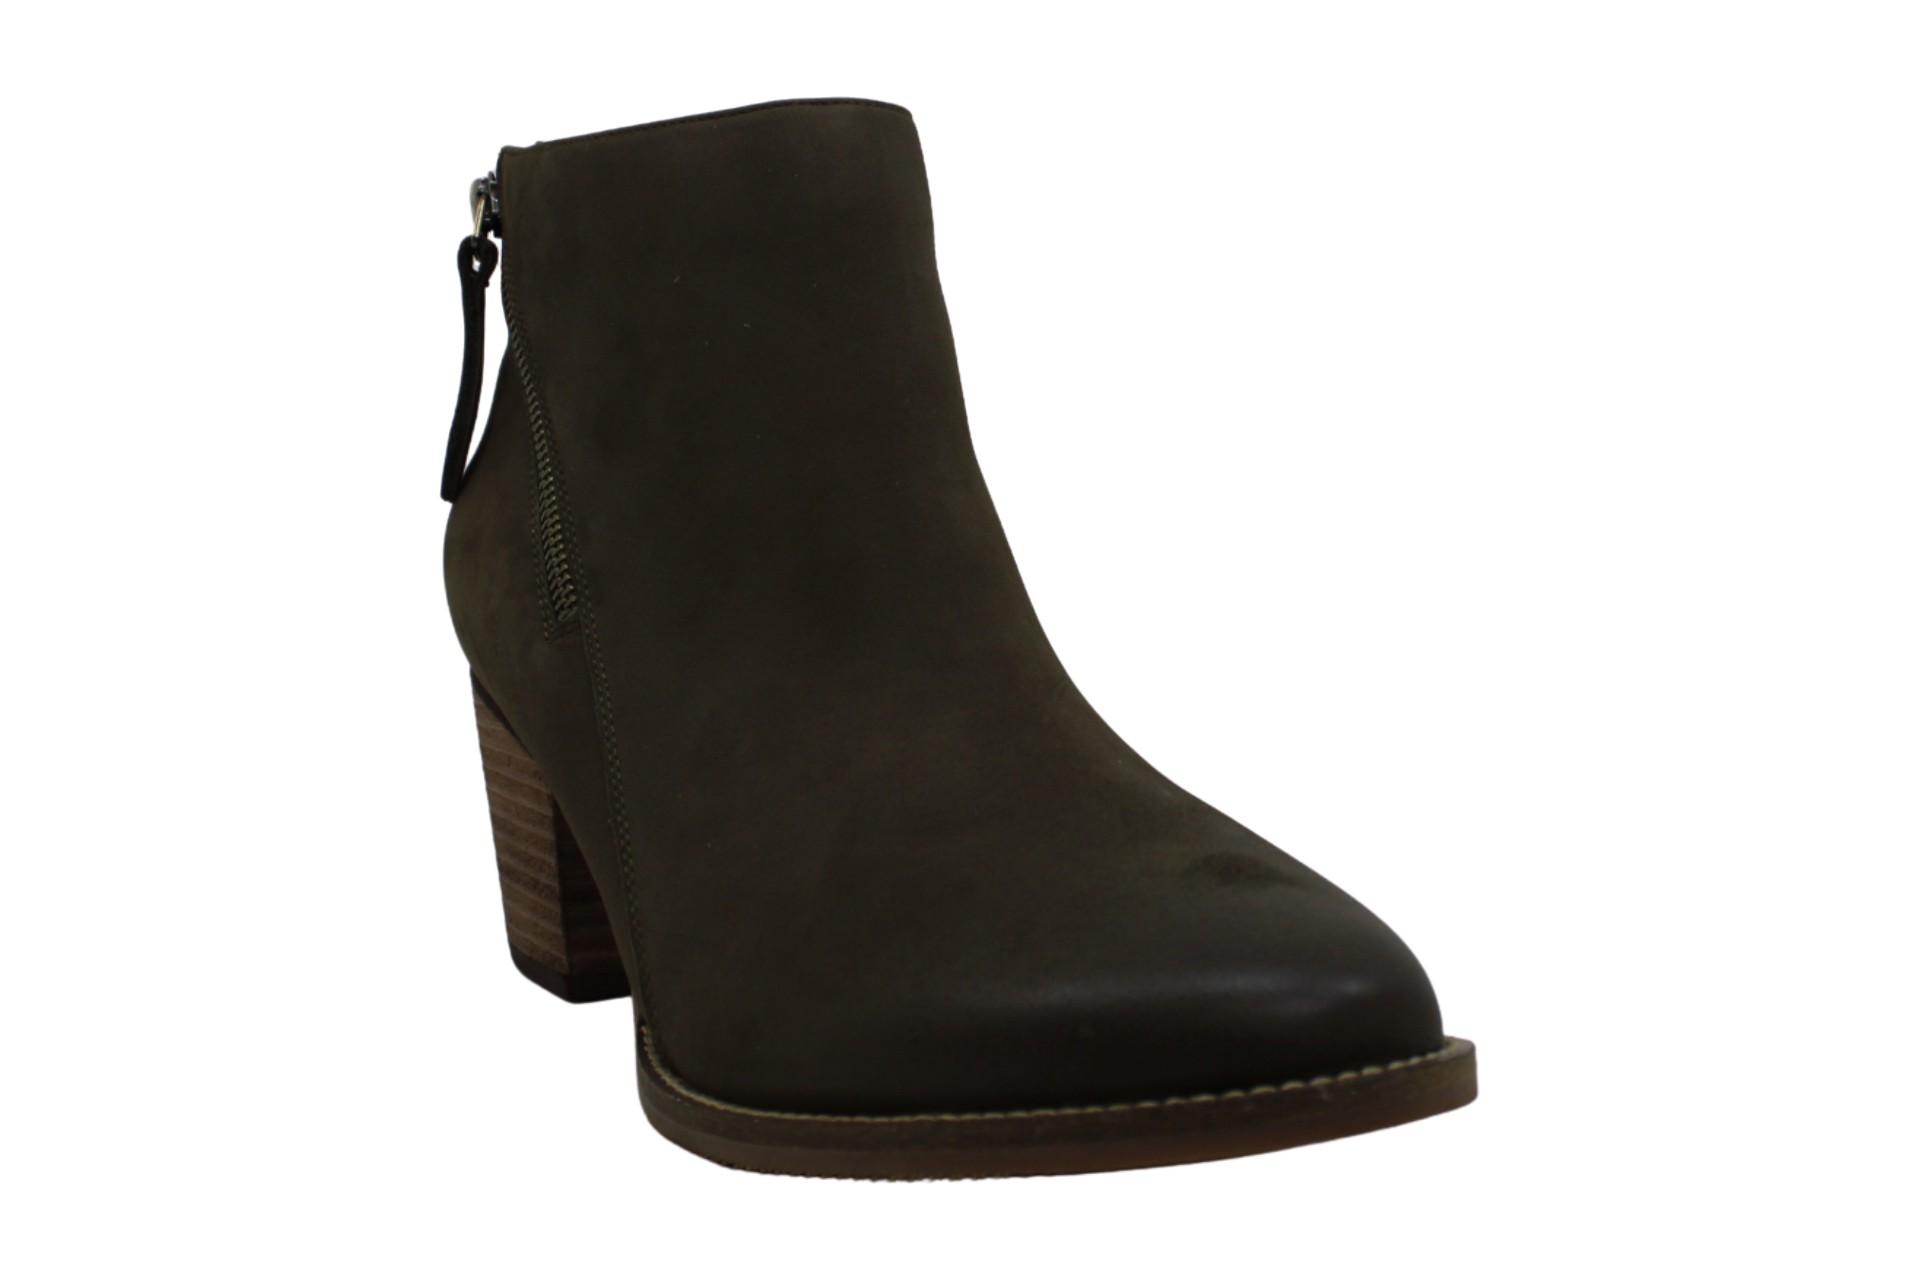 thumbnail 12 - Aqua-College-Womens-Nancy-Leather-Almond-Toe-Ankle-Fashion-Boots